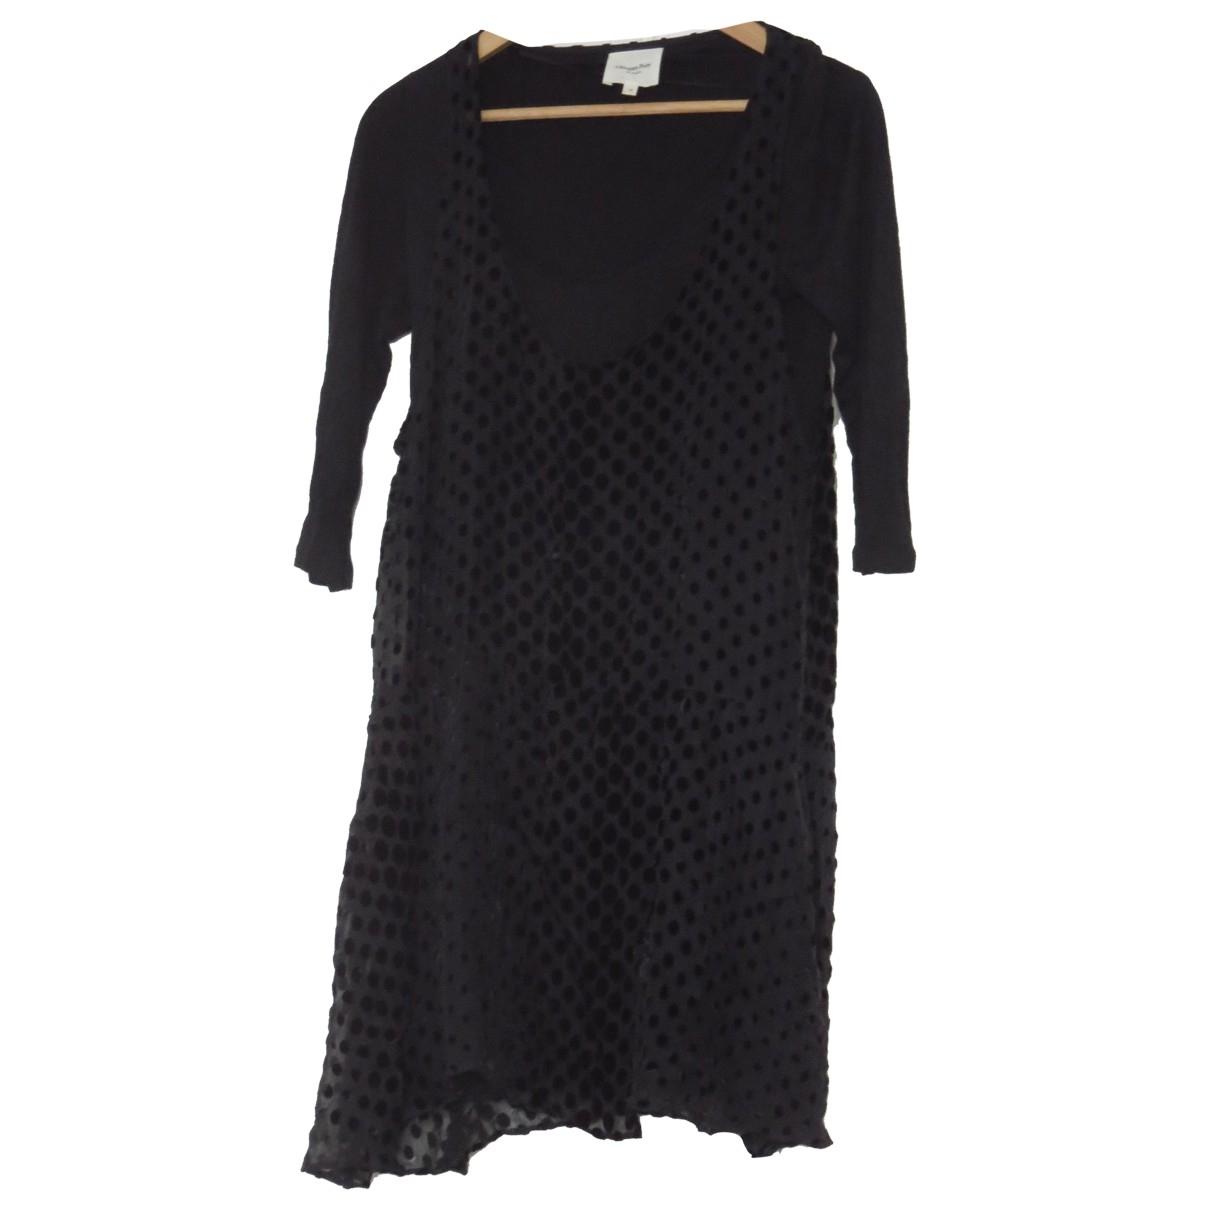 Pablo \N Black Cotton - elasthane dress for Women 36 FR